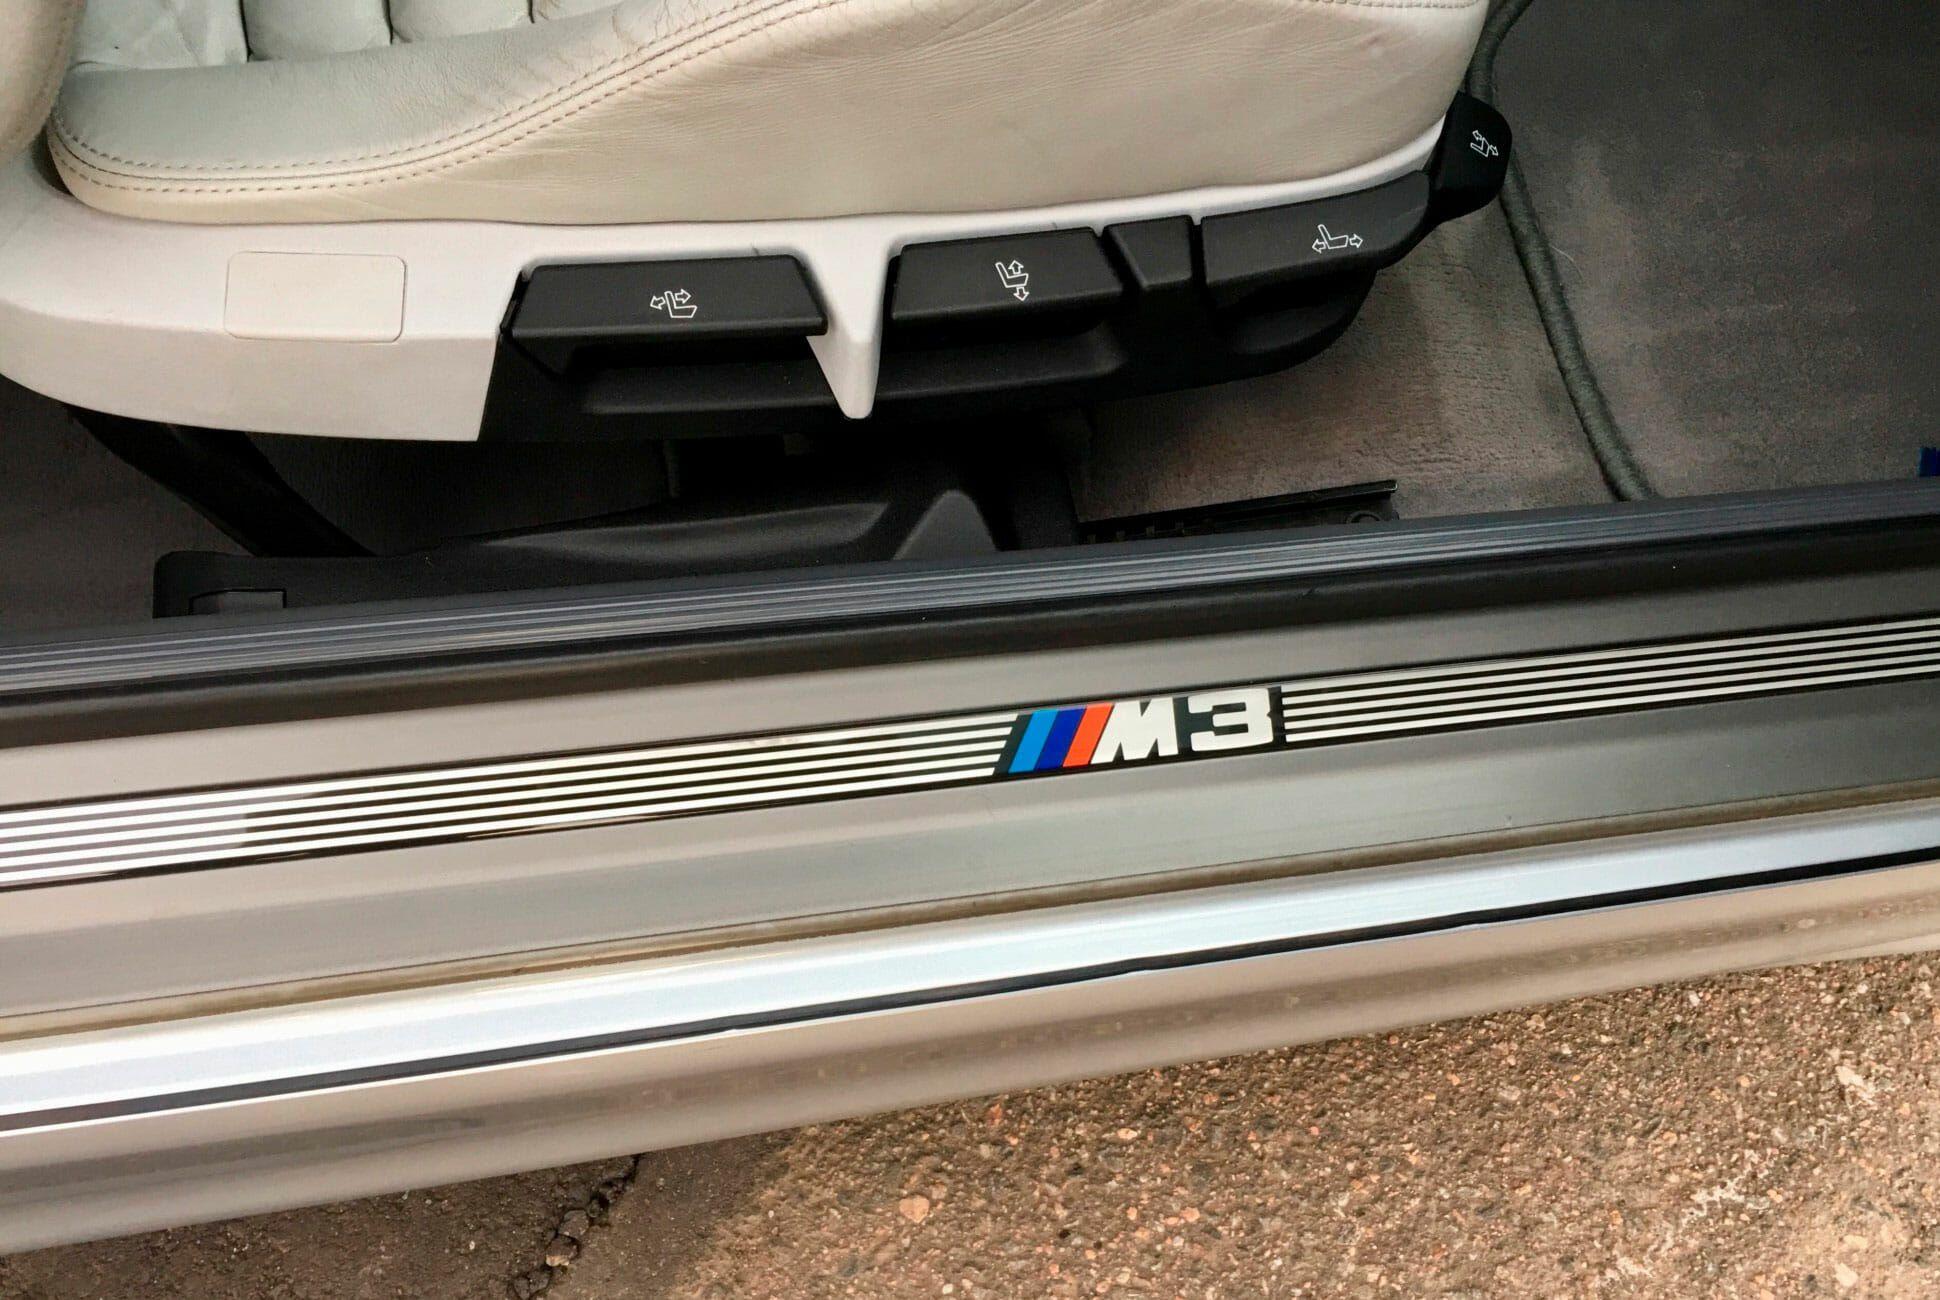 1996-BMW-M3-Coupe-5-Speed-gear-patrol-slide-05